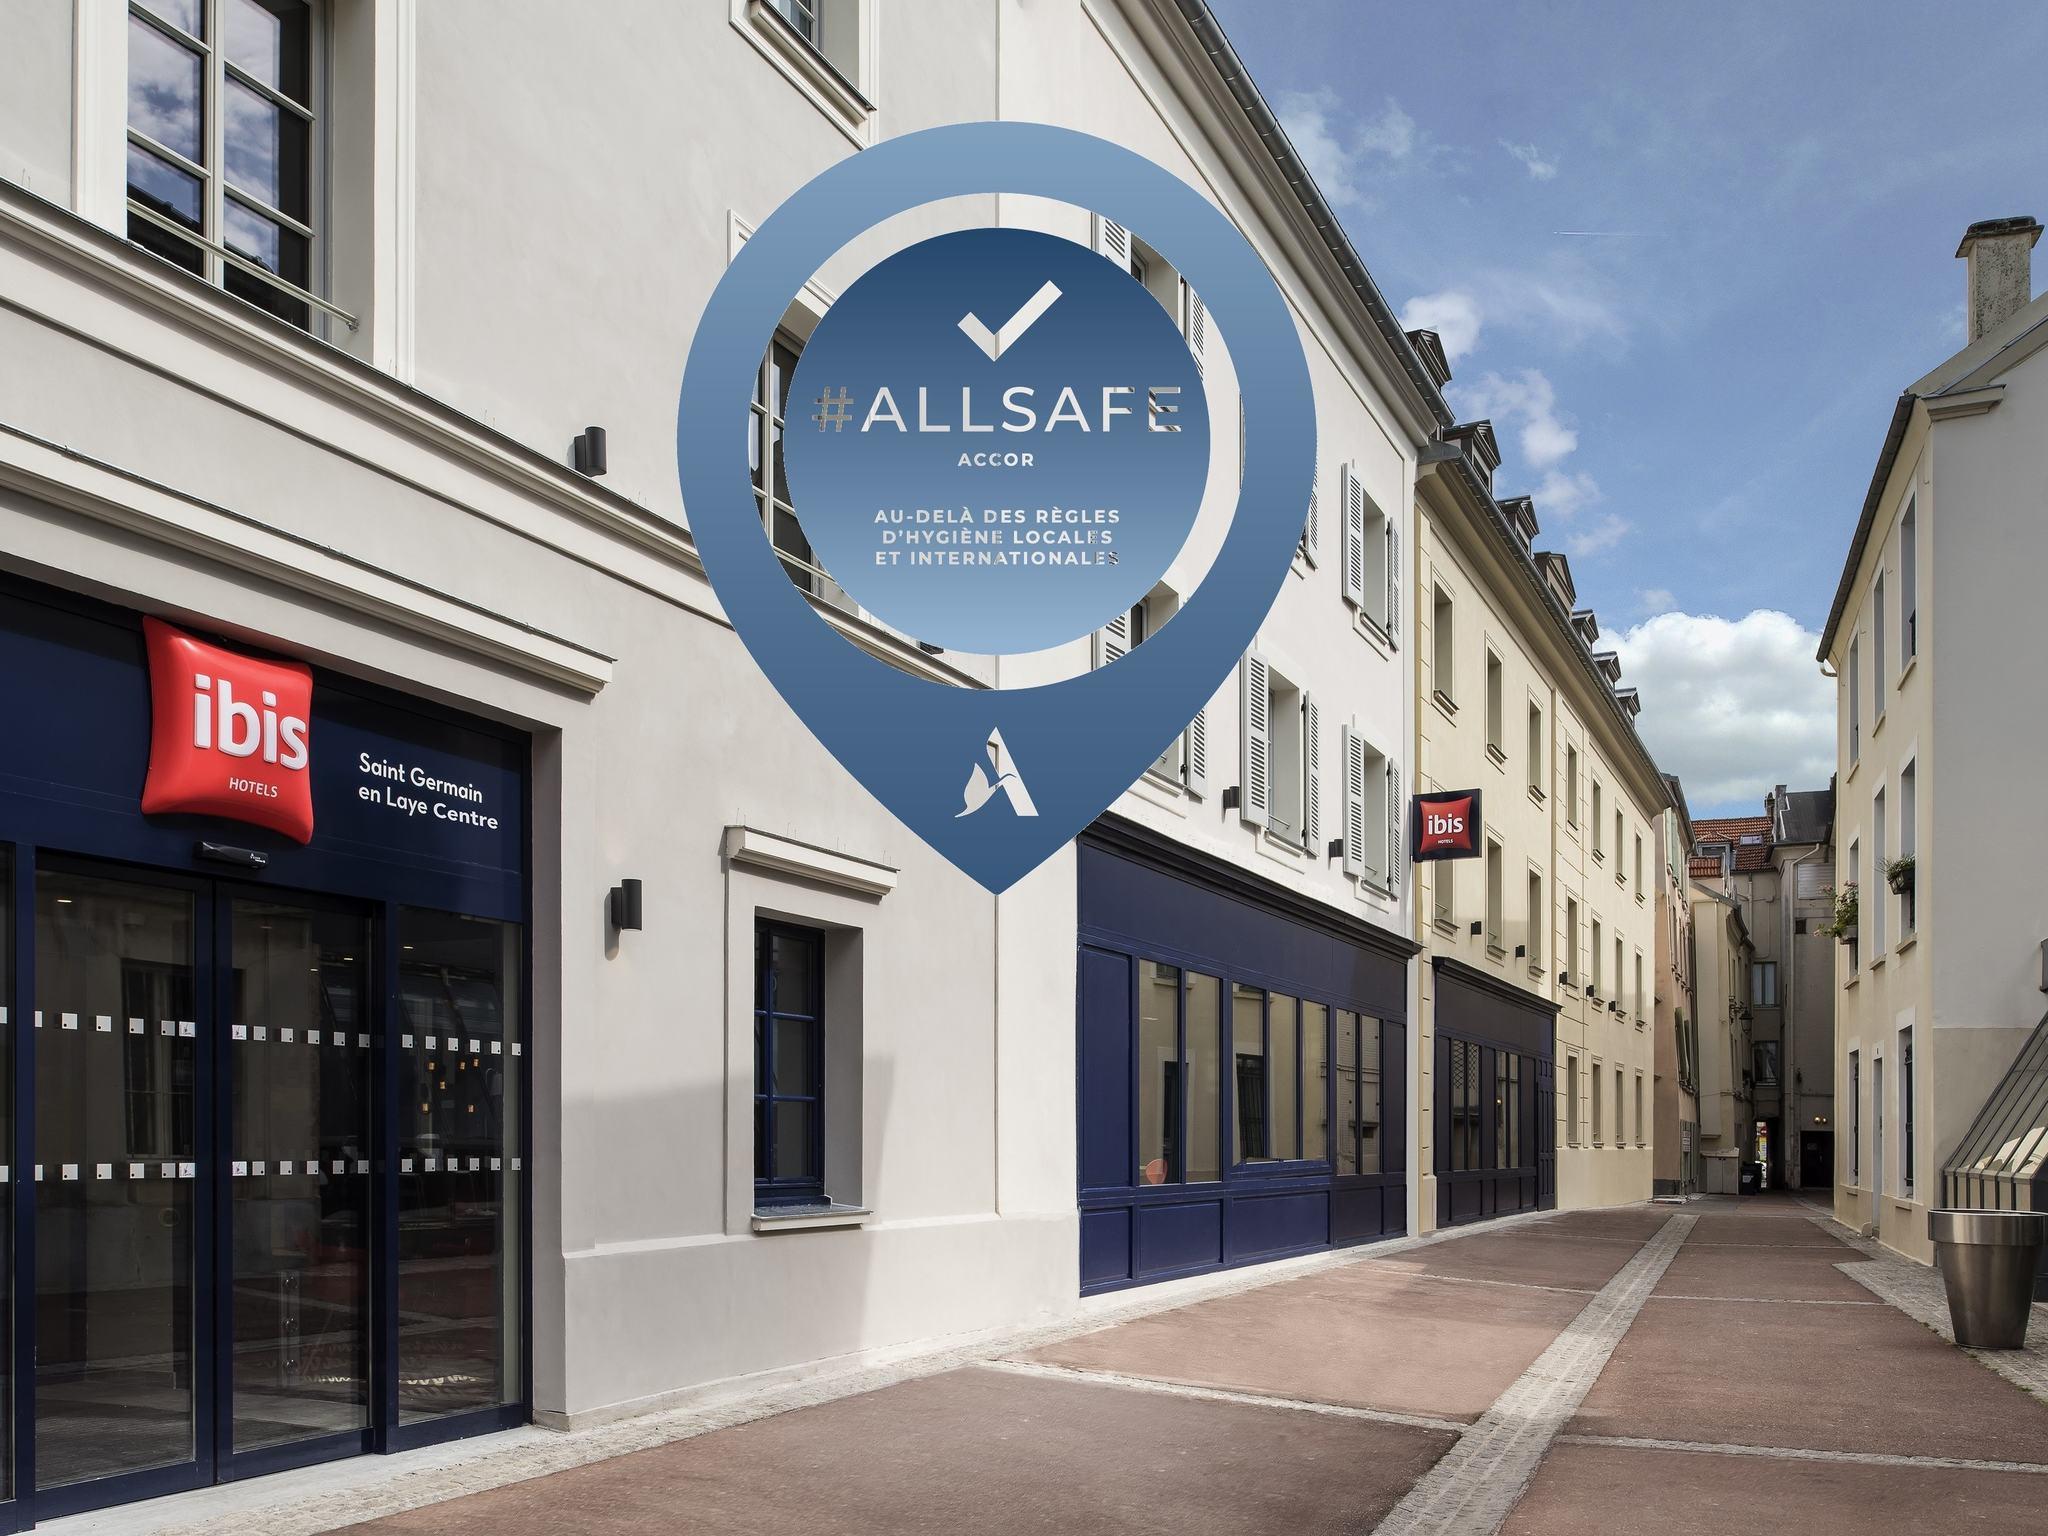 Отель — ibis Saint-Germain-en-Laye Centre